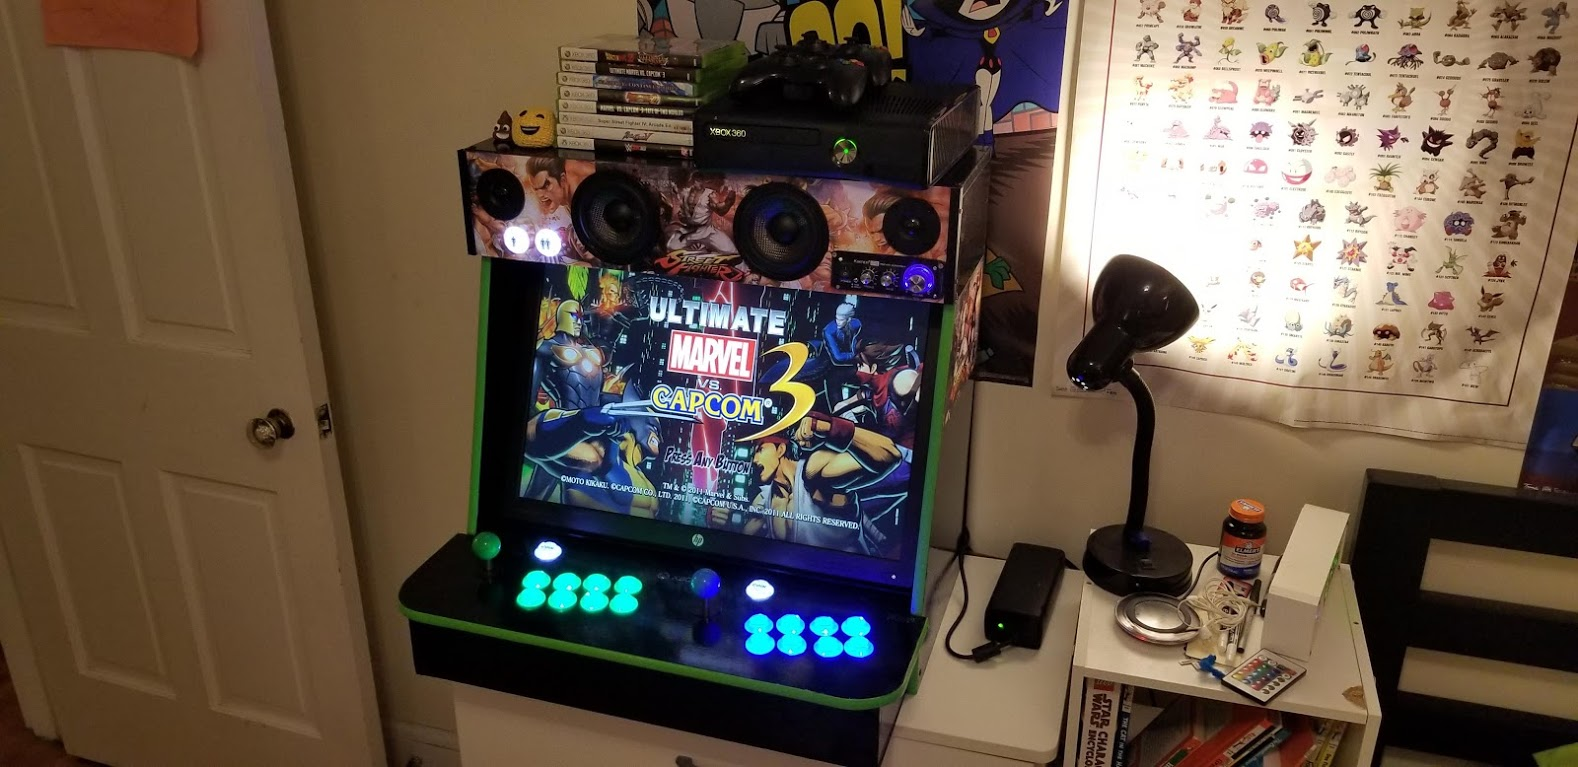 Picture of XBox360 Arcade